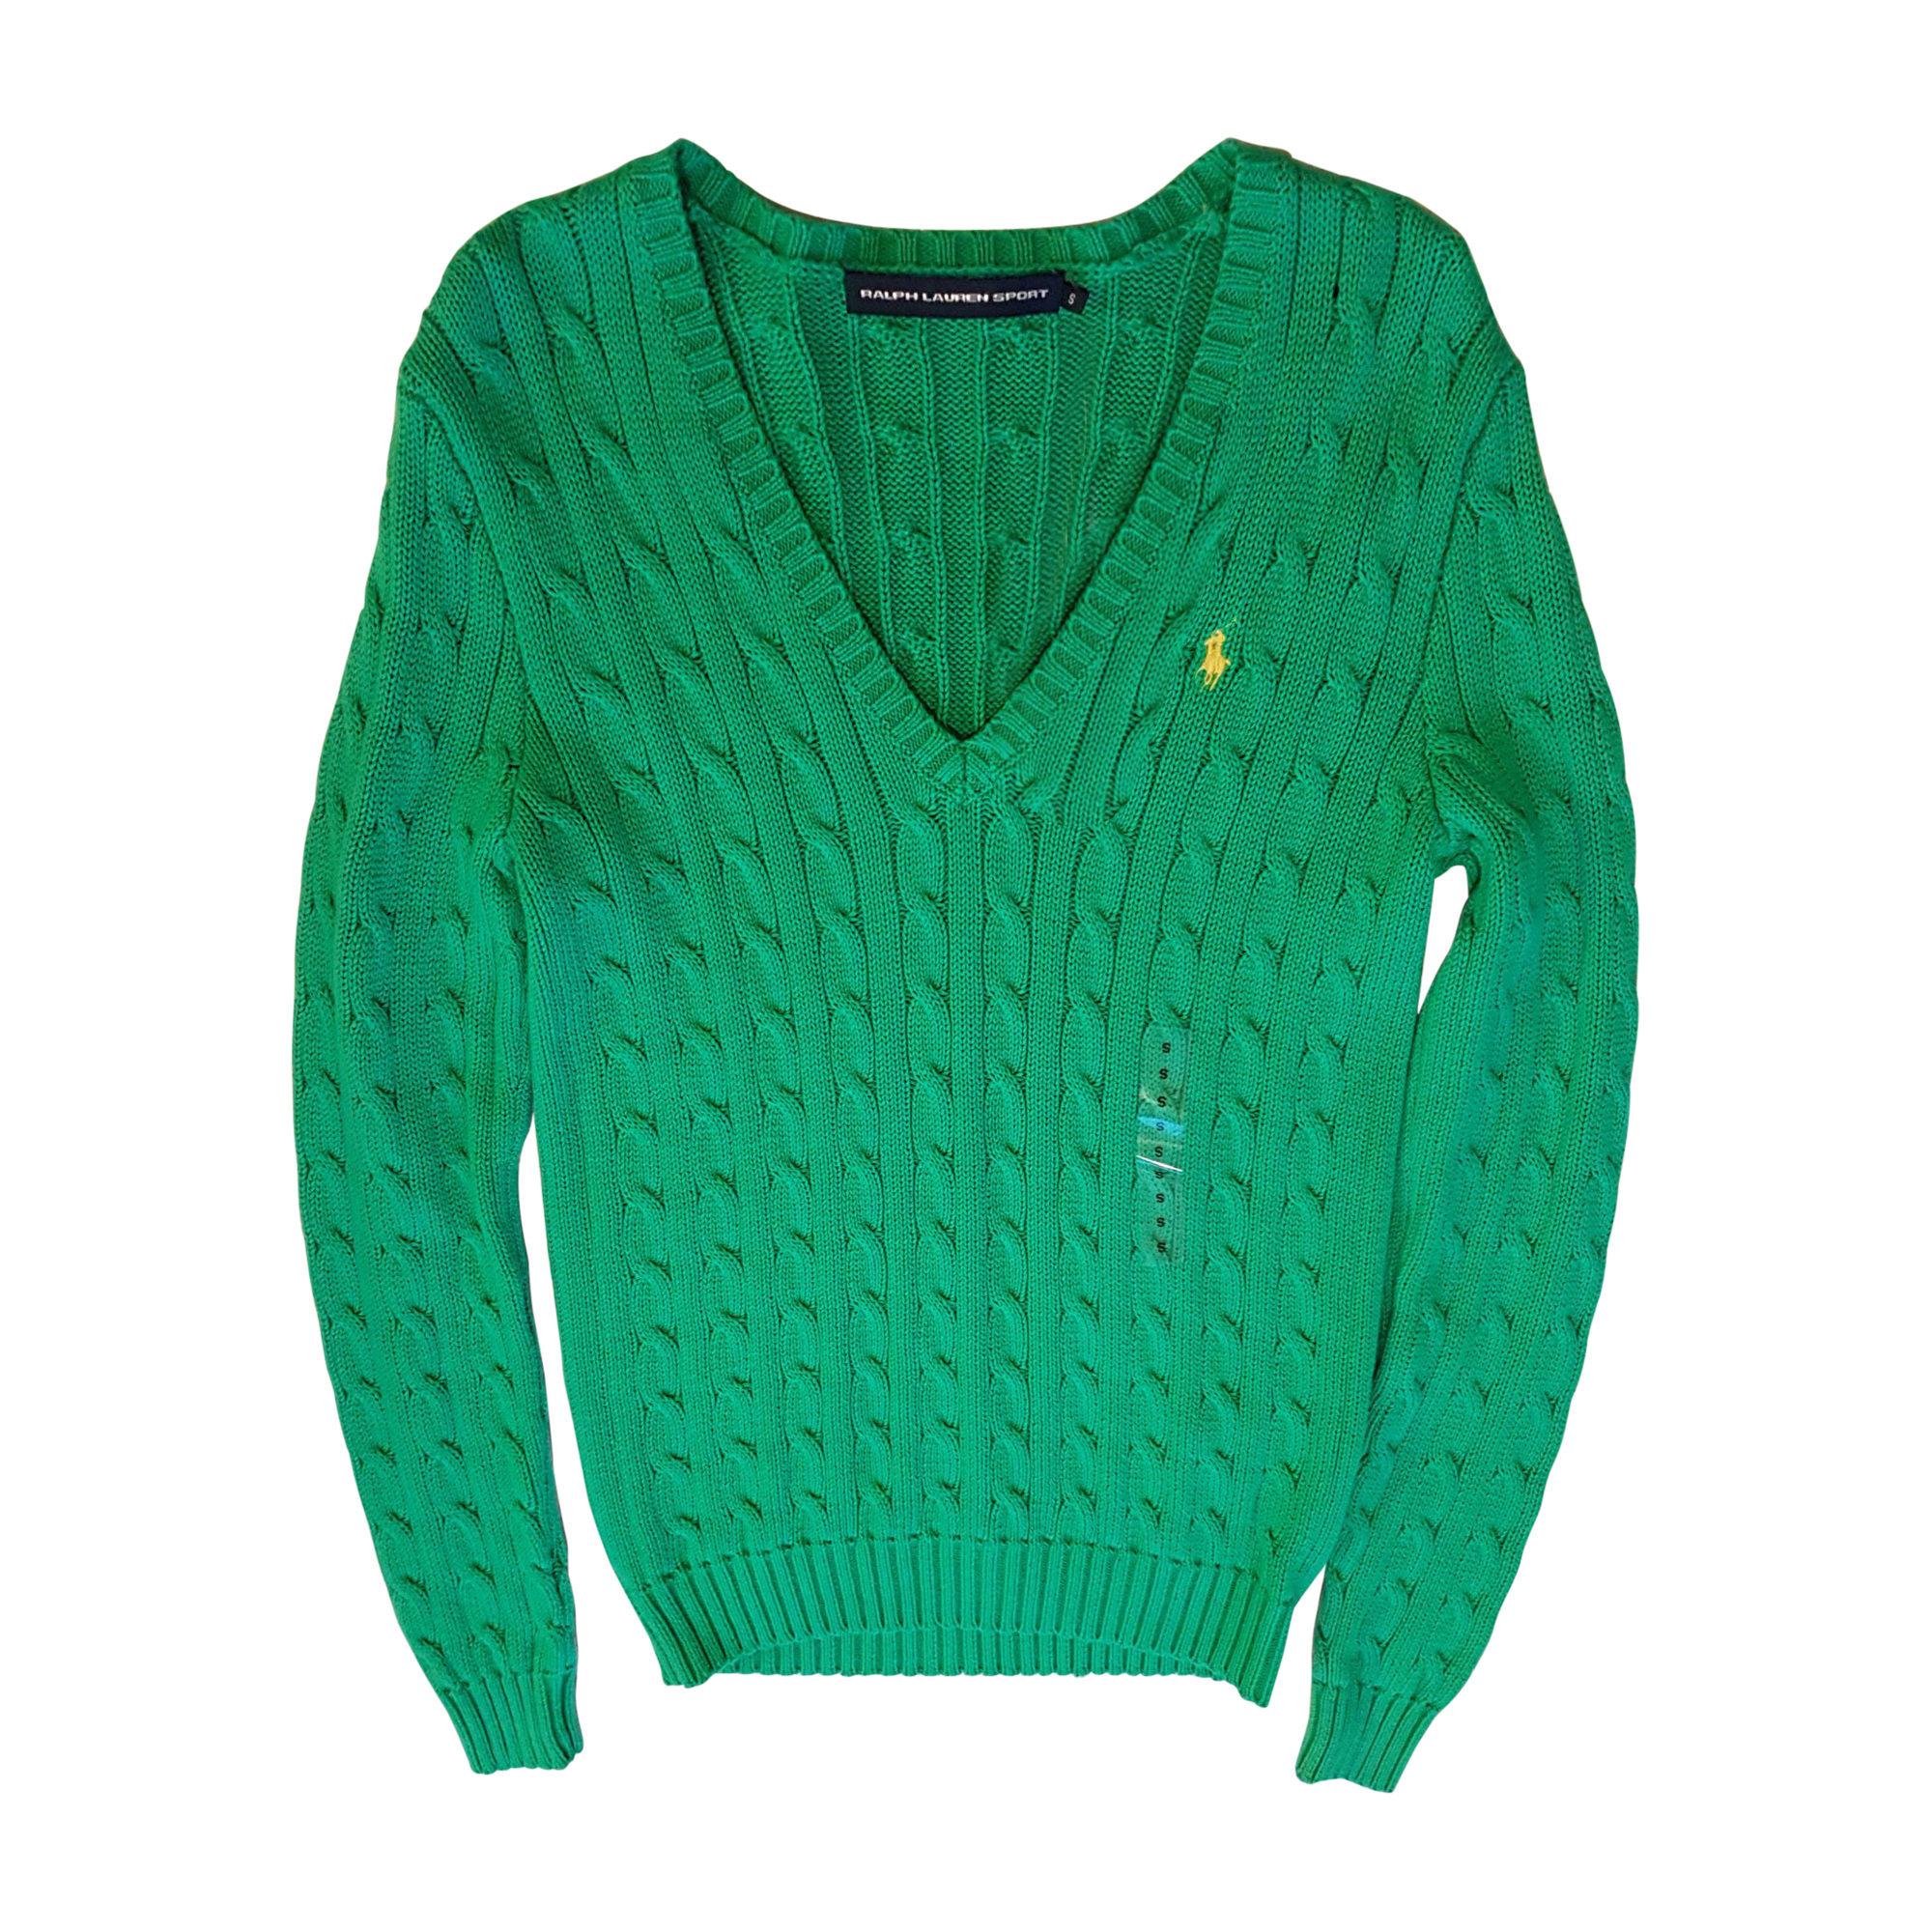 45515aa7e668 Pull RALPH LAUREN 36 (S, T1) vert - 8368726